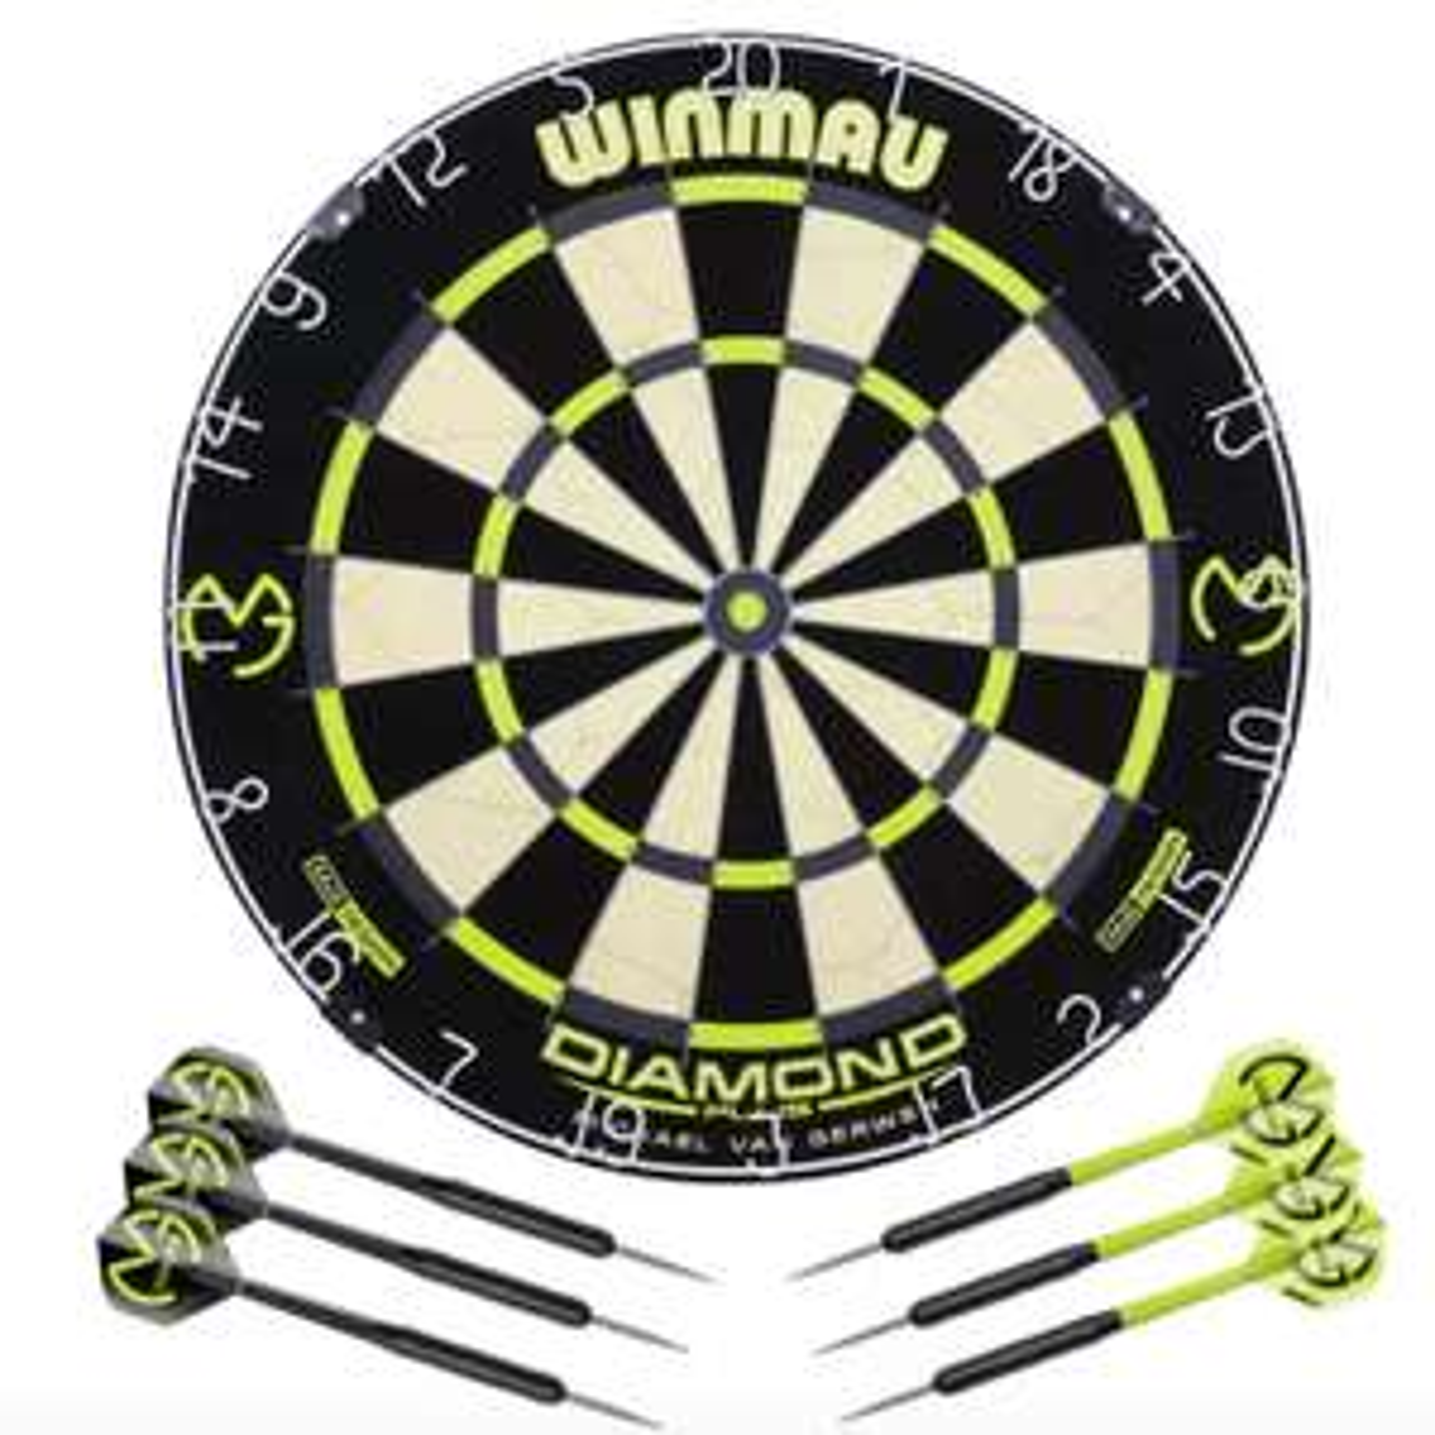 Winmau Michael van Gerwen Diamond Dartboard and Darts Set + extras £28 (free click and collect) @ Argos